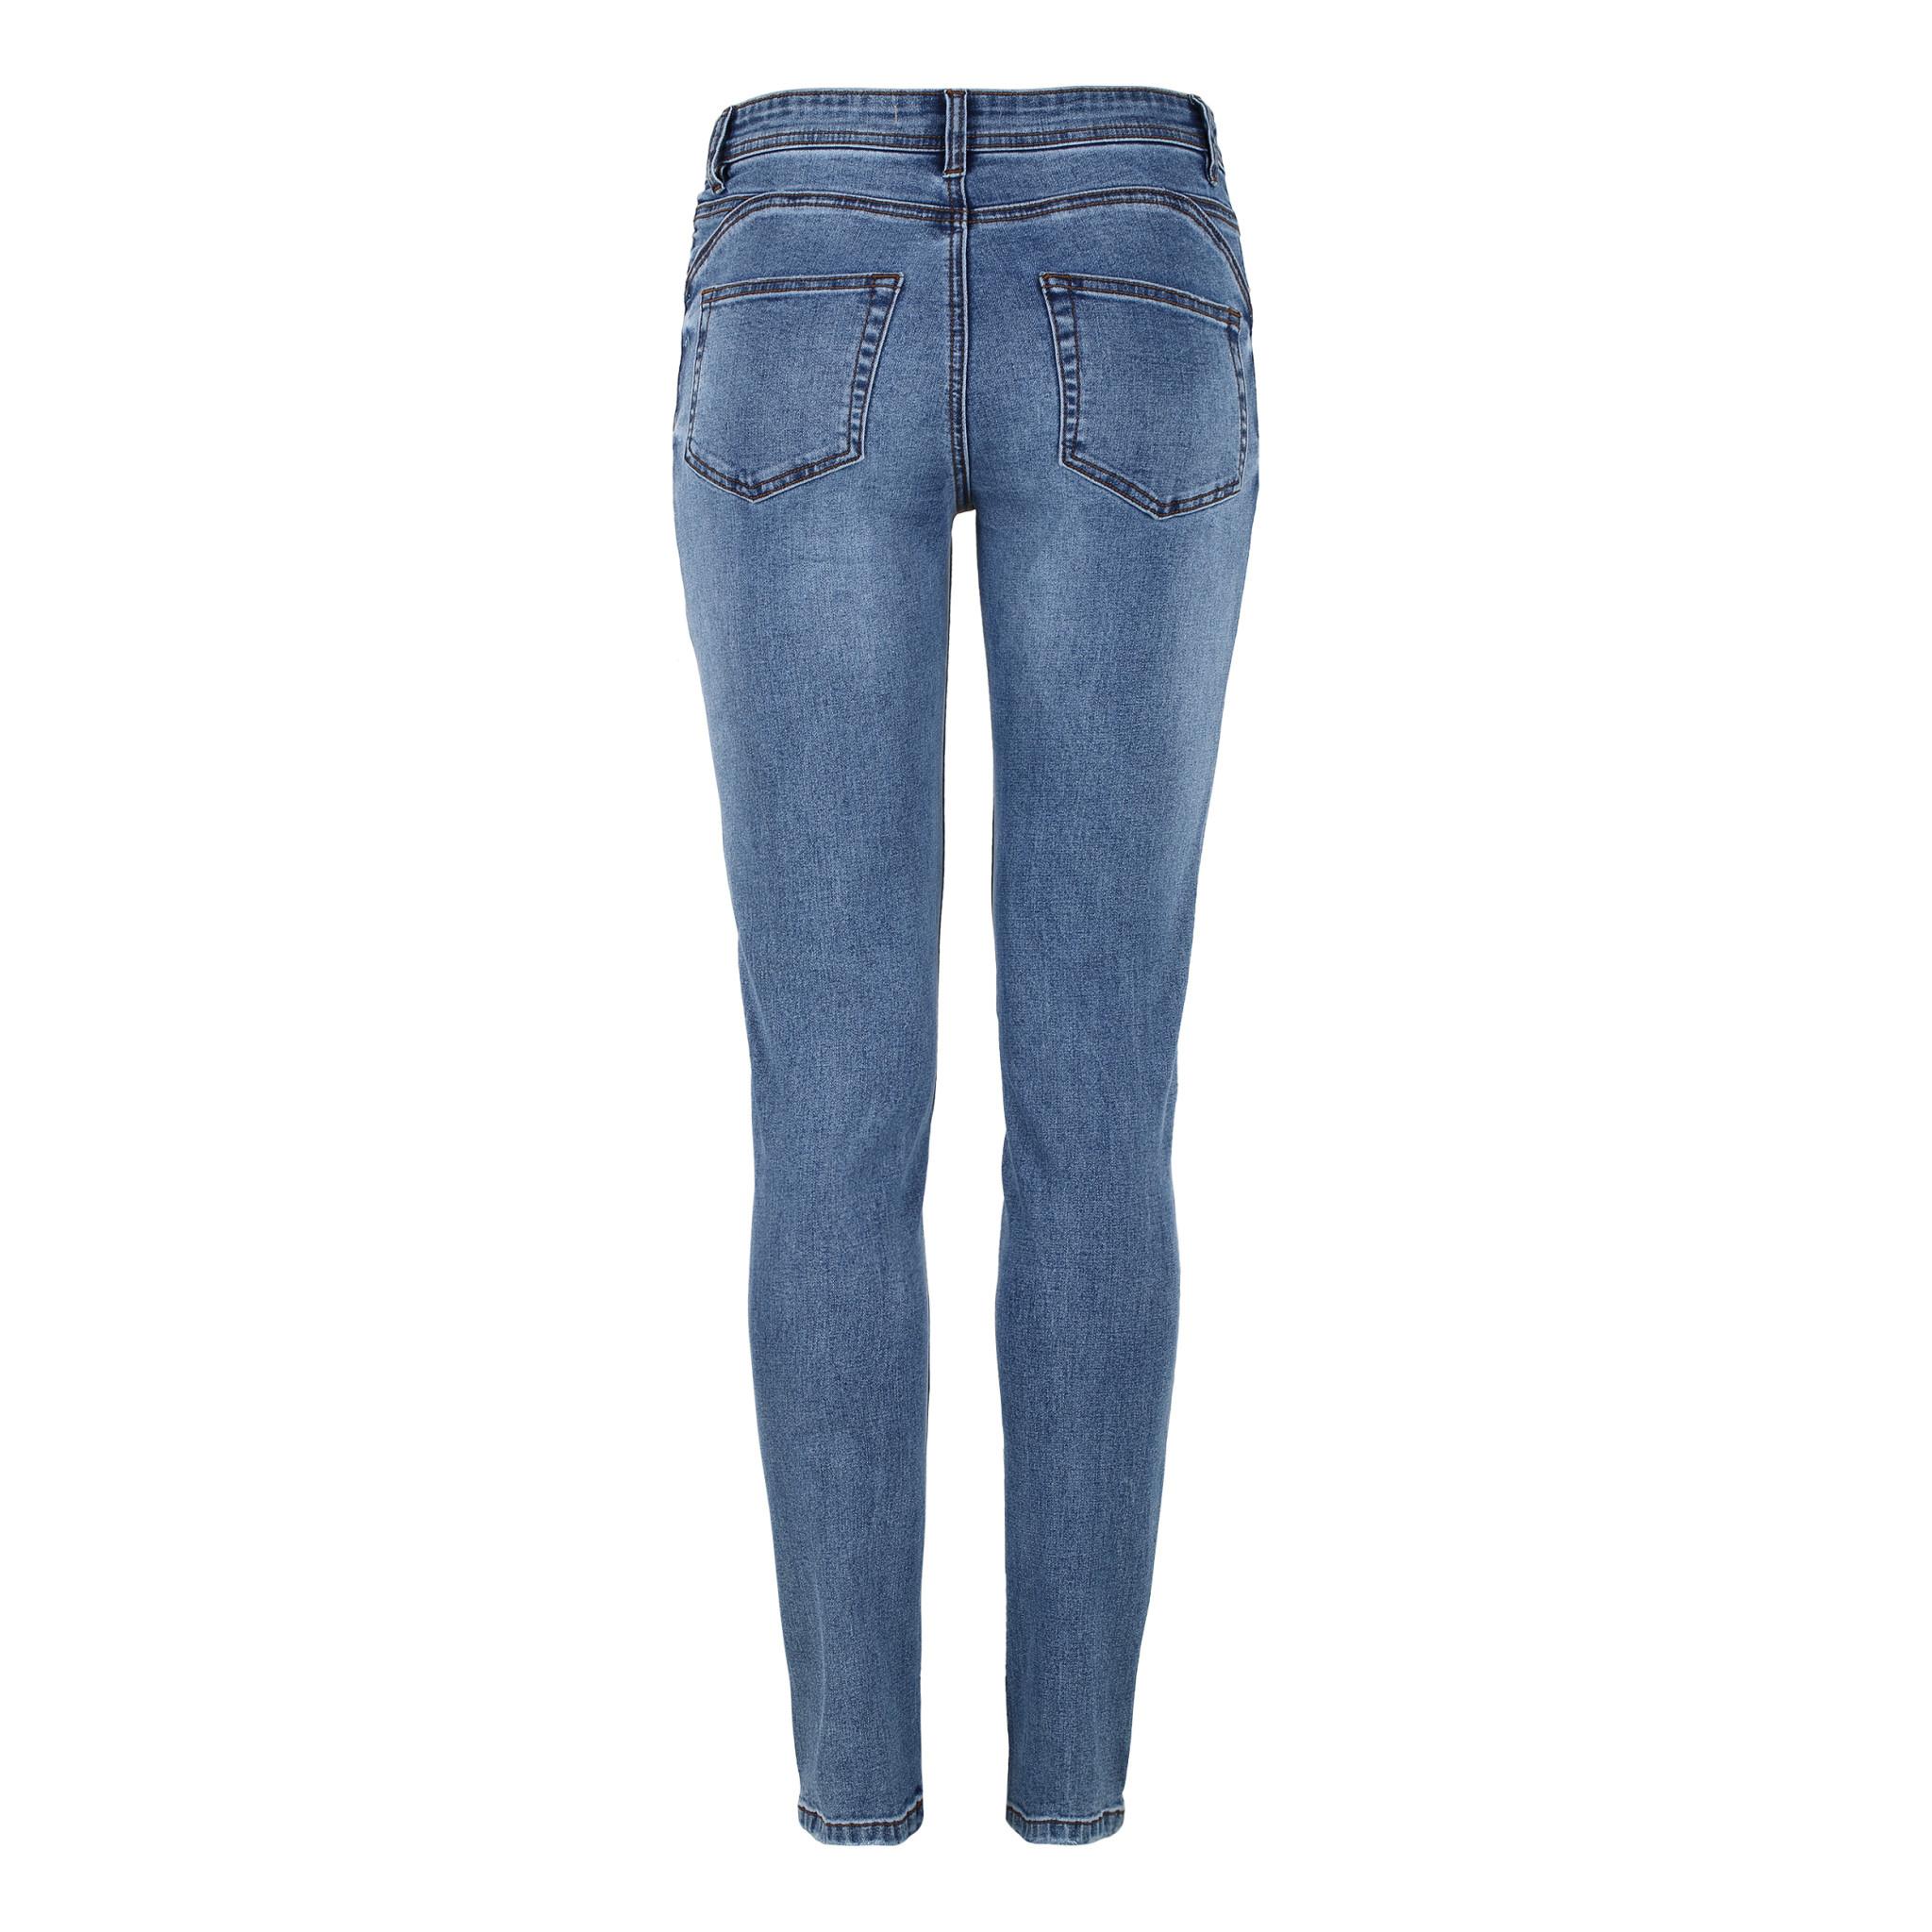 Soft Rebels Mid Rise Slim Jeans Light Blue